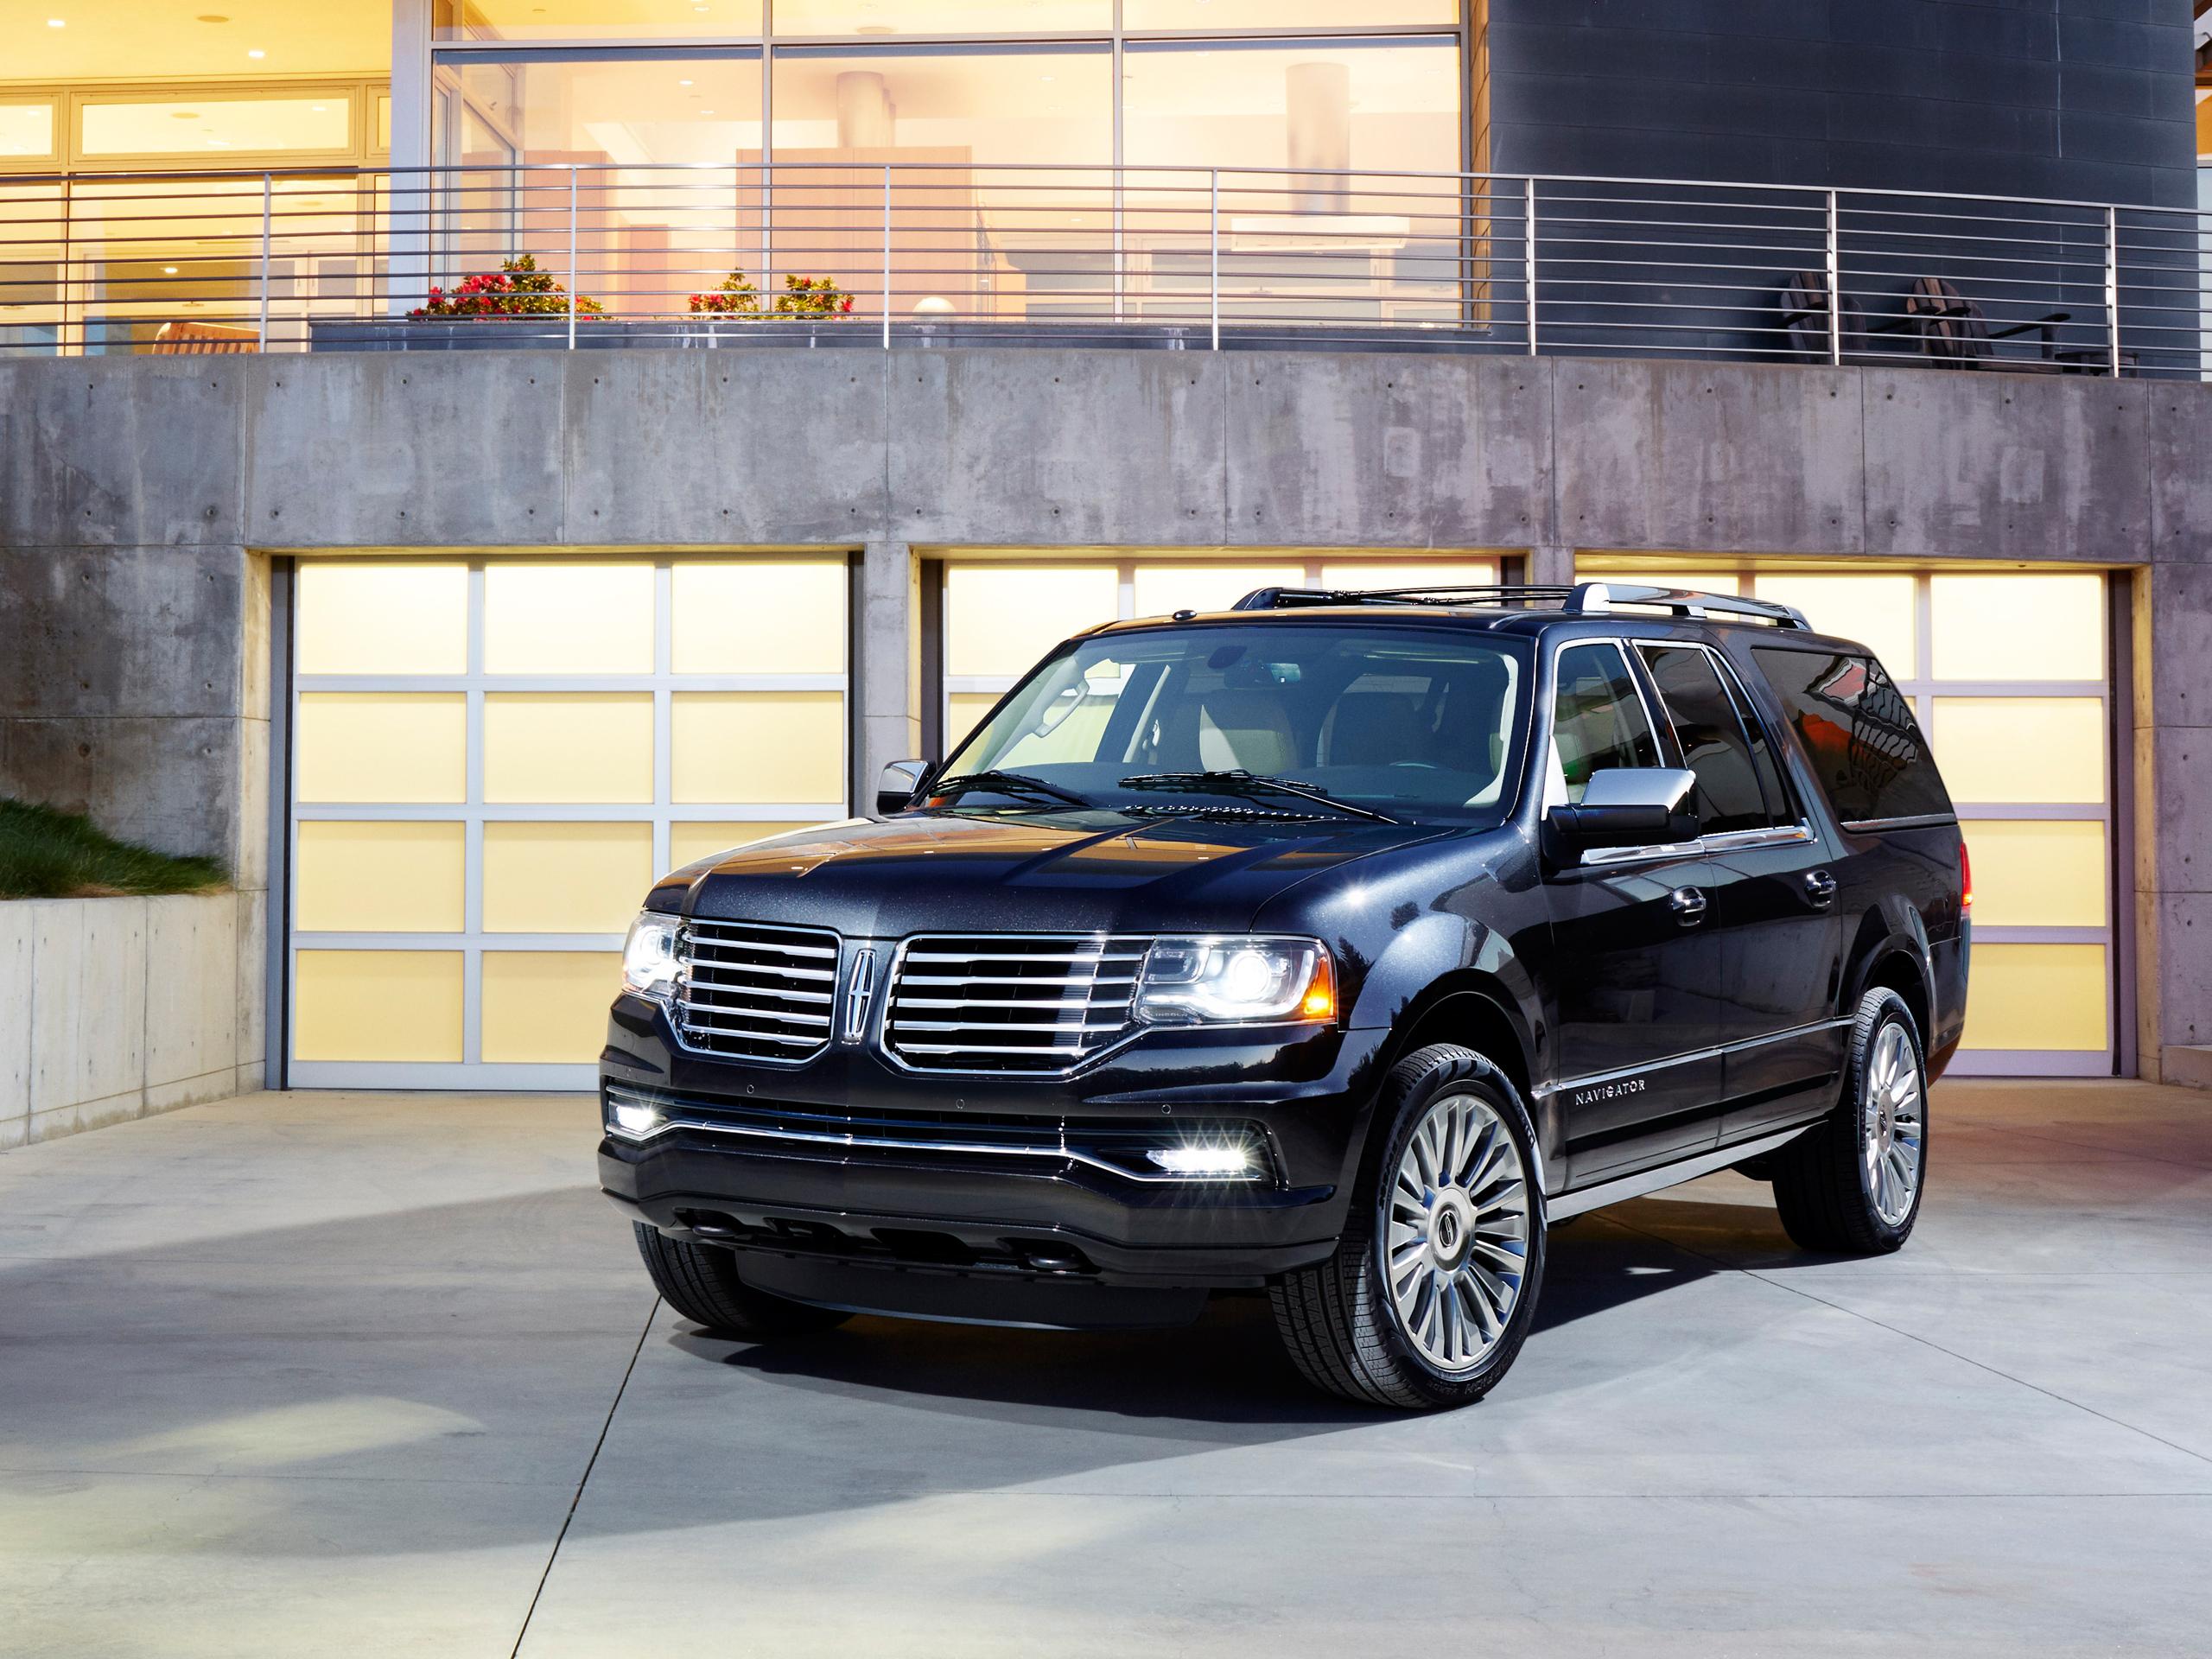 Lincoln Navigator Facelift: Premiere auf der Chicago Auto Show 8